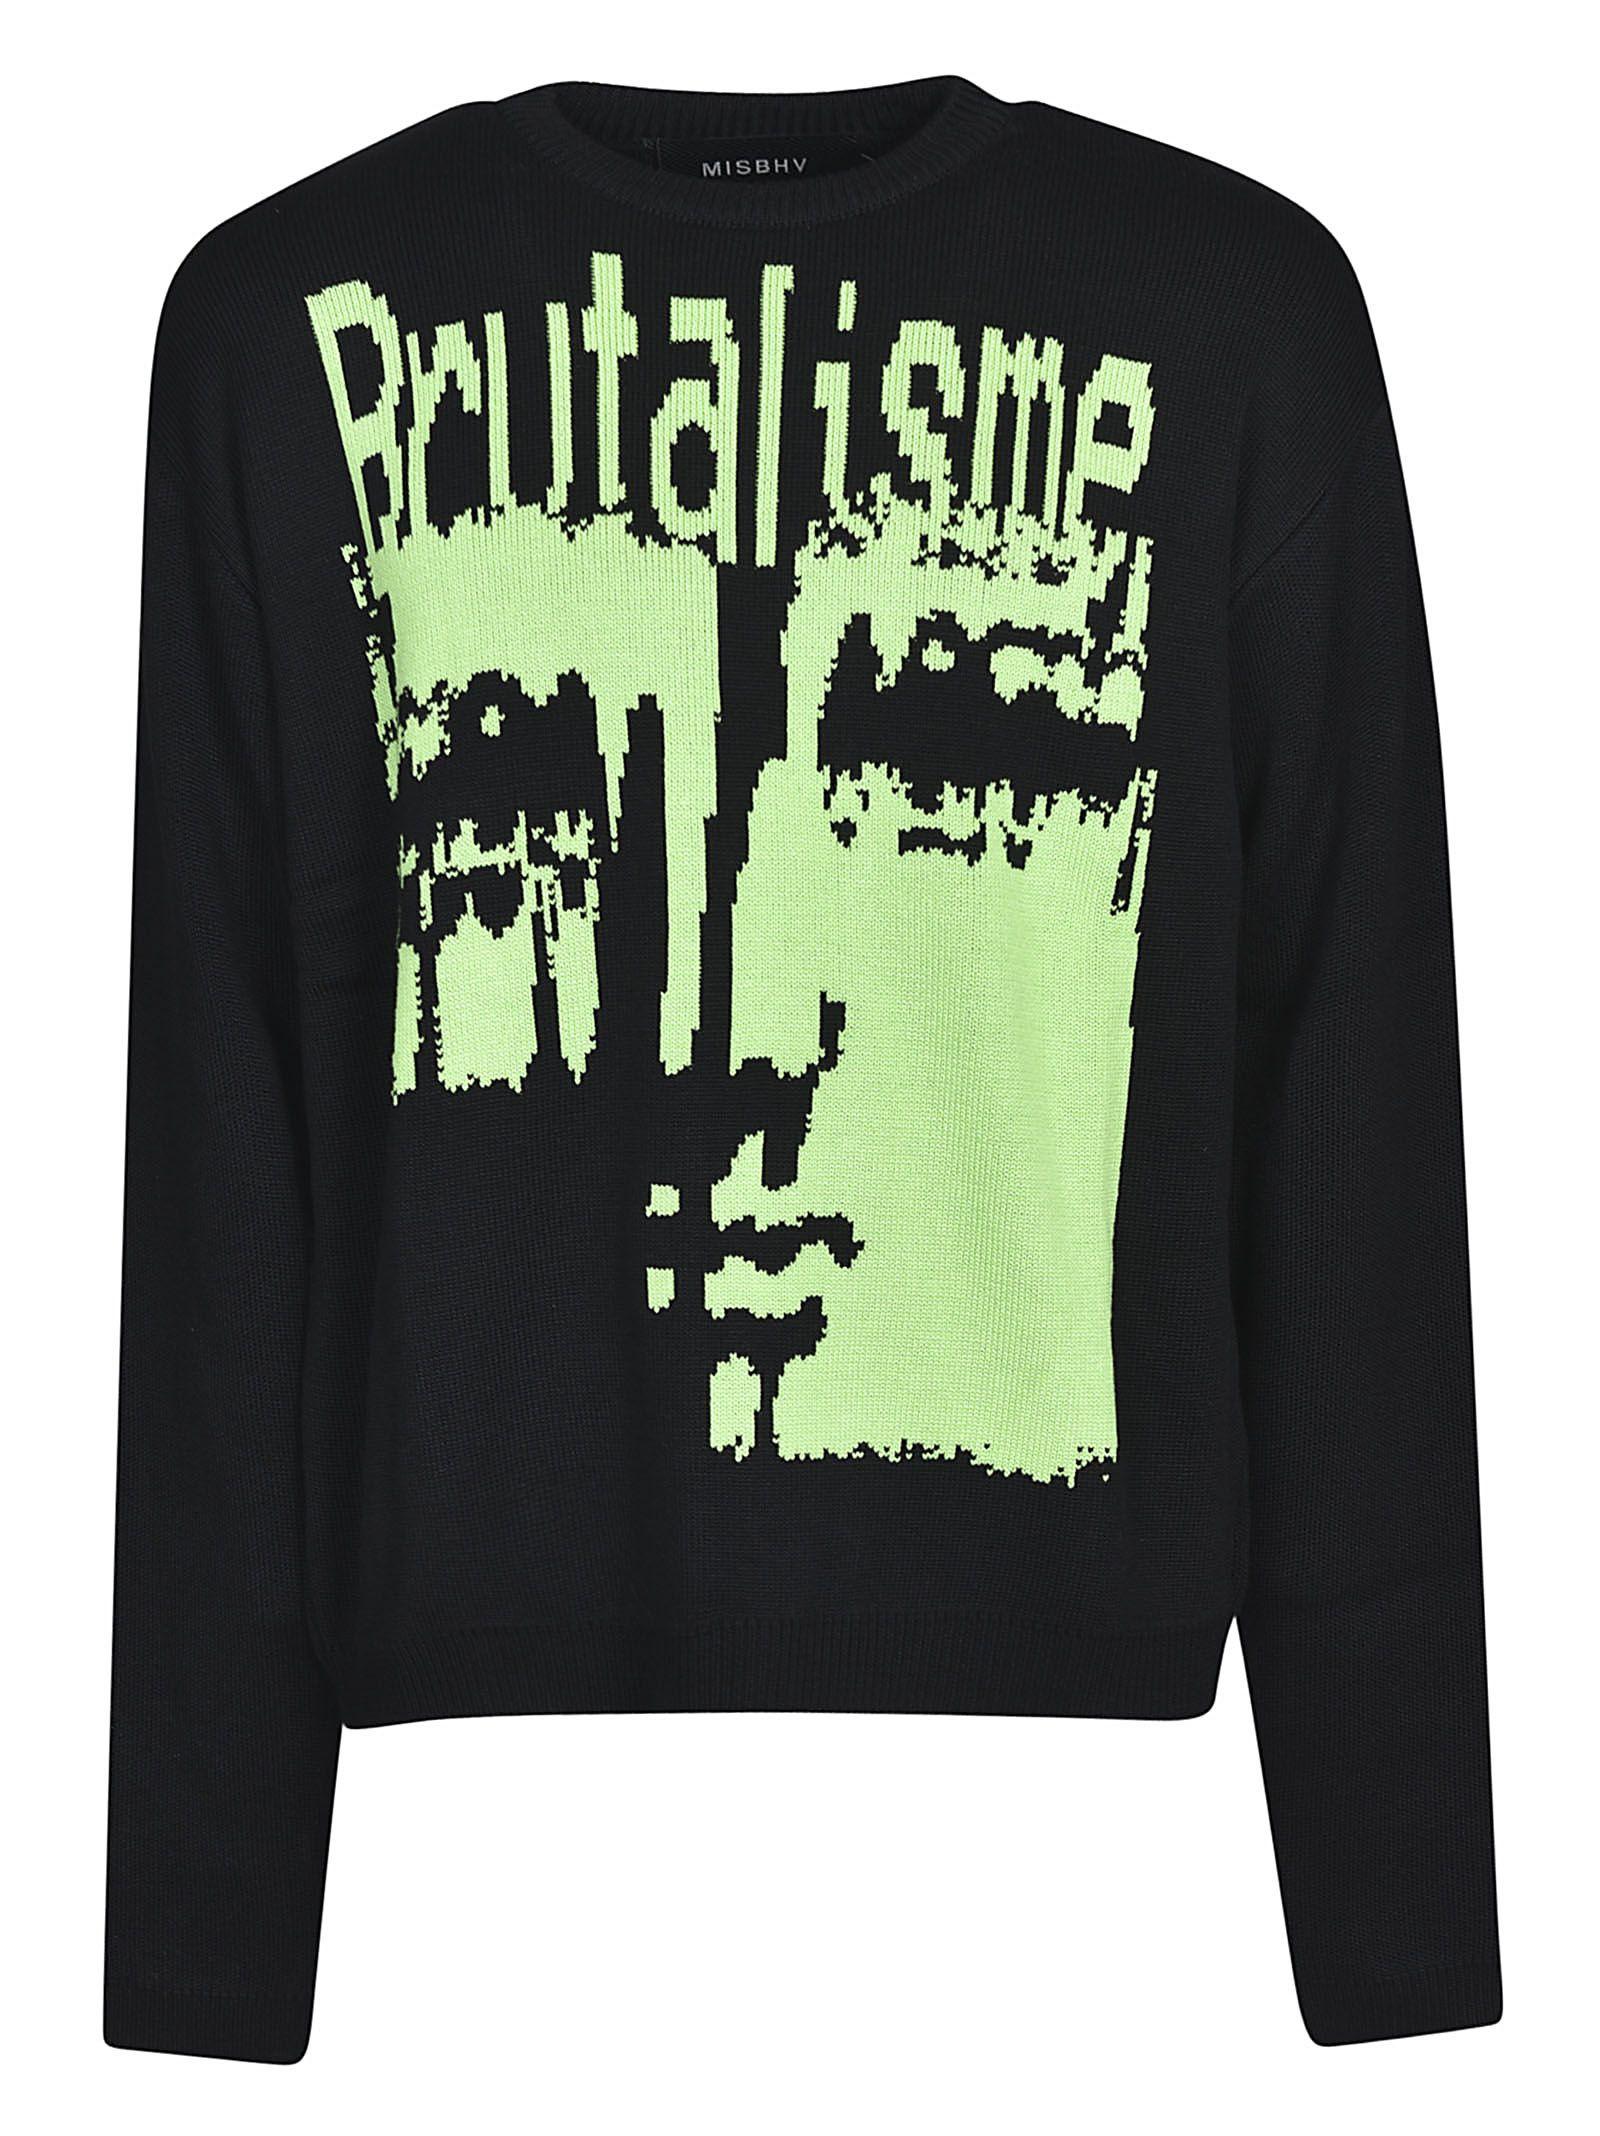 Misbhv Brutalisme Sweatshirt